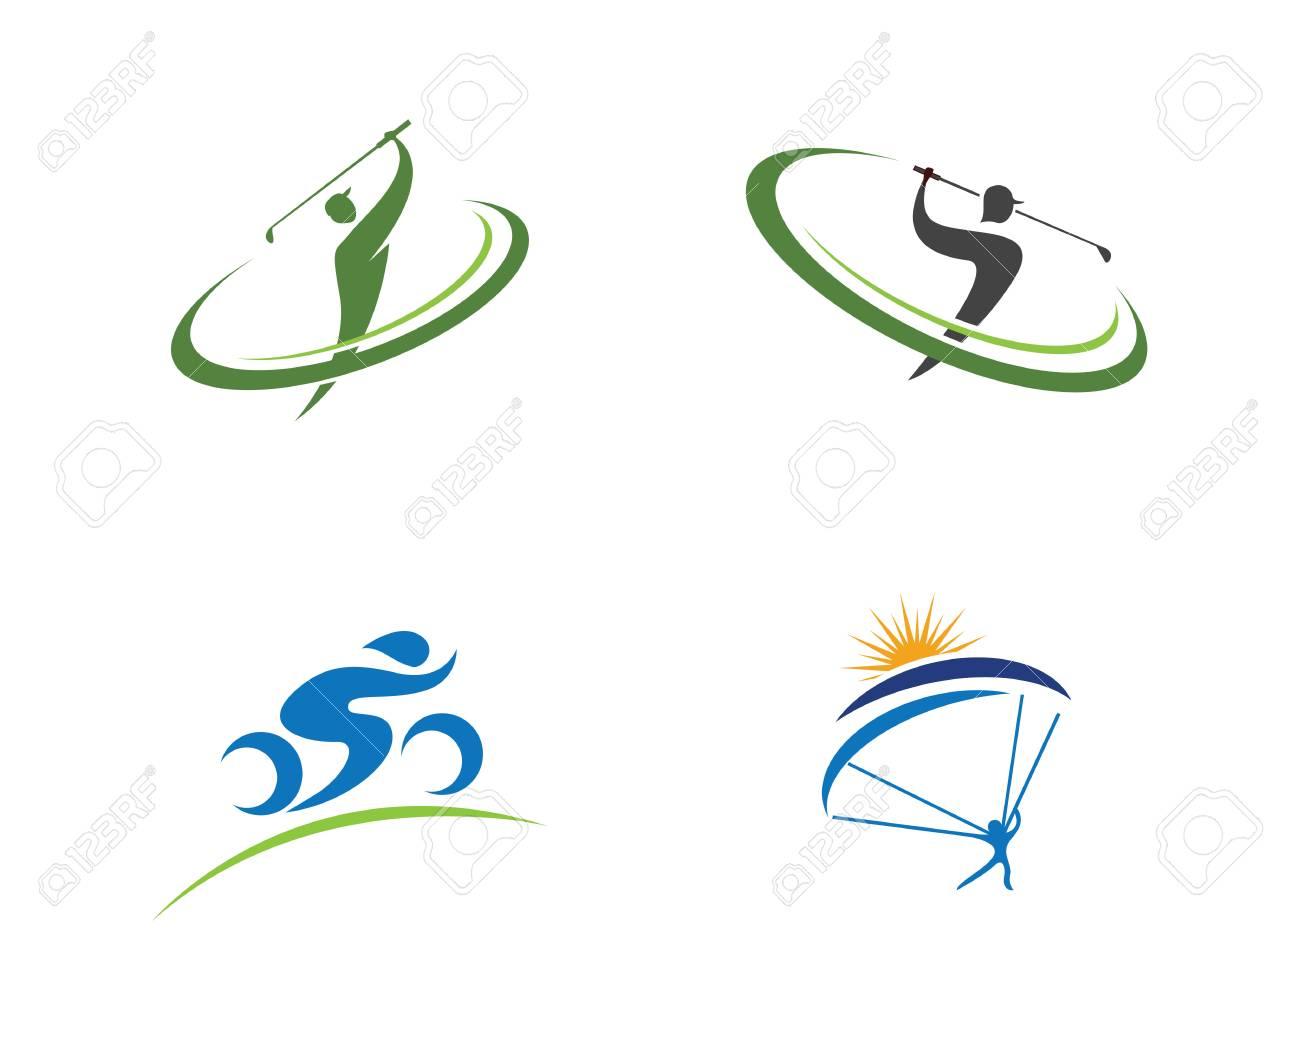 golf logo template vector illustration icon design royalty free rh 123rf com vector golf ball icon vector golf clubs